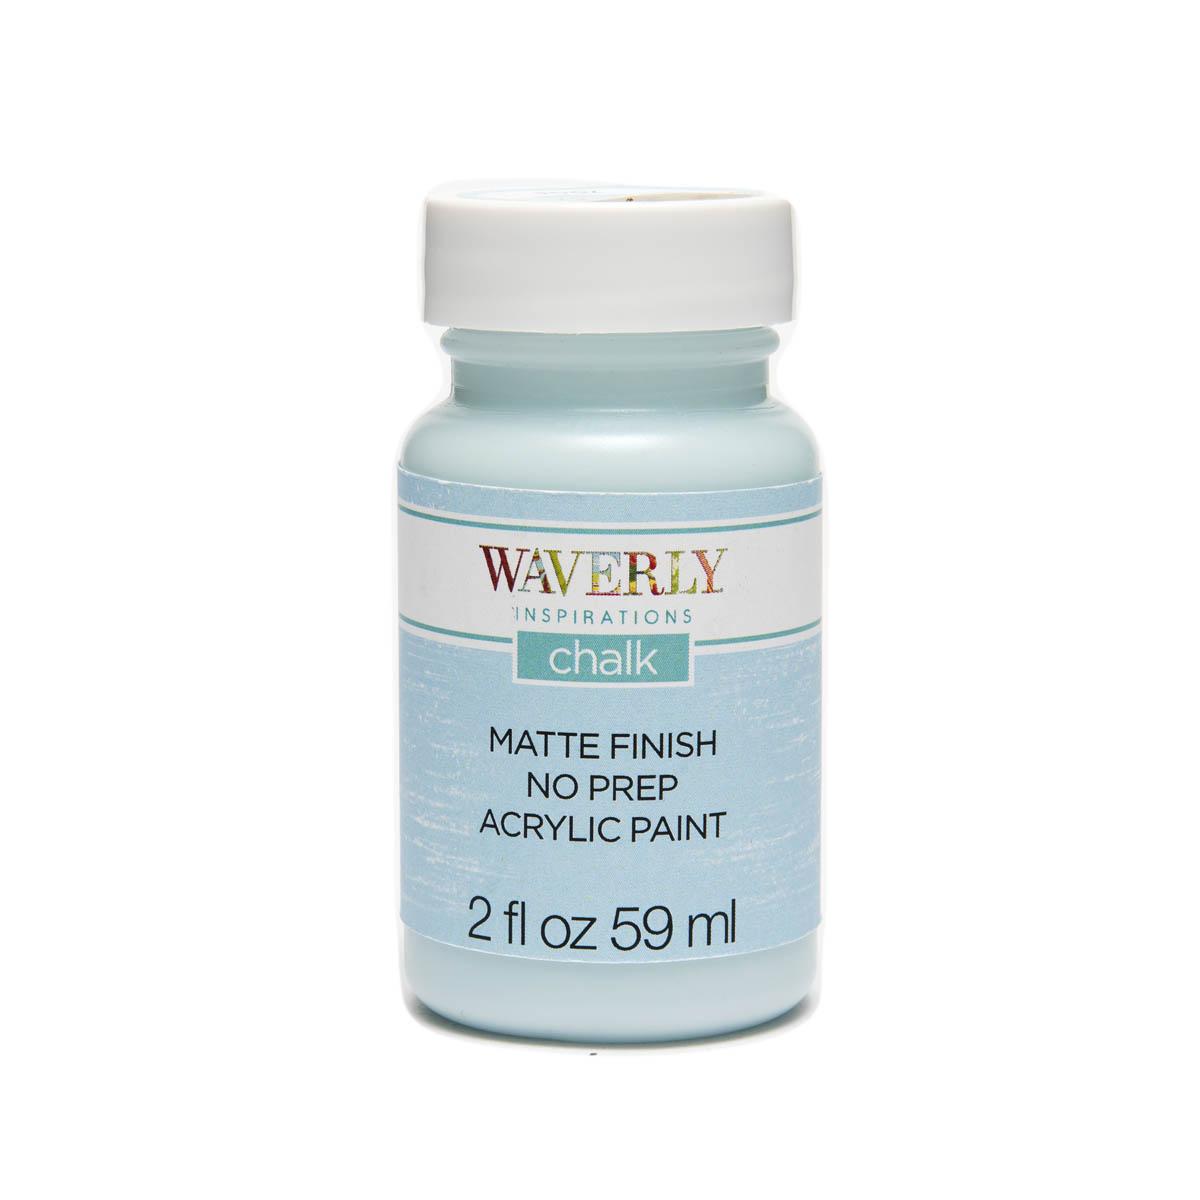 Waverly ® Inspirations Chalk Finish Acrylic Paint - Pool, 2 oz.